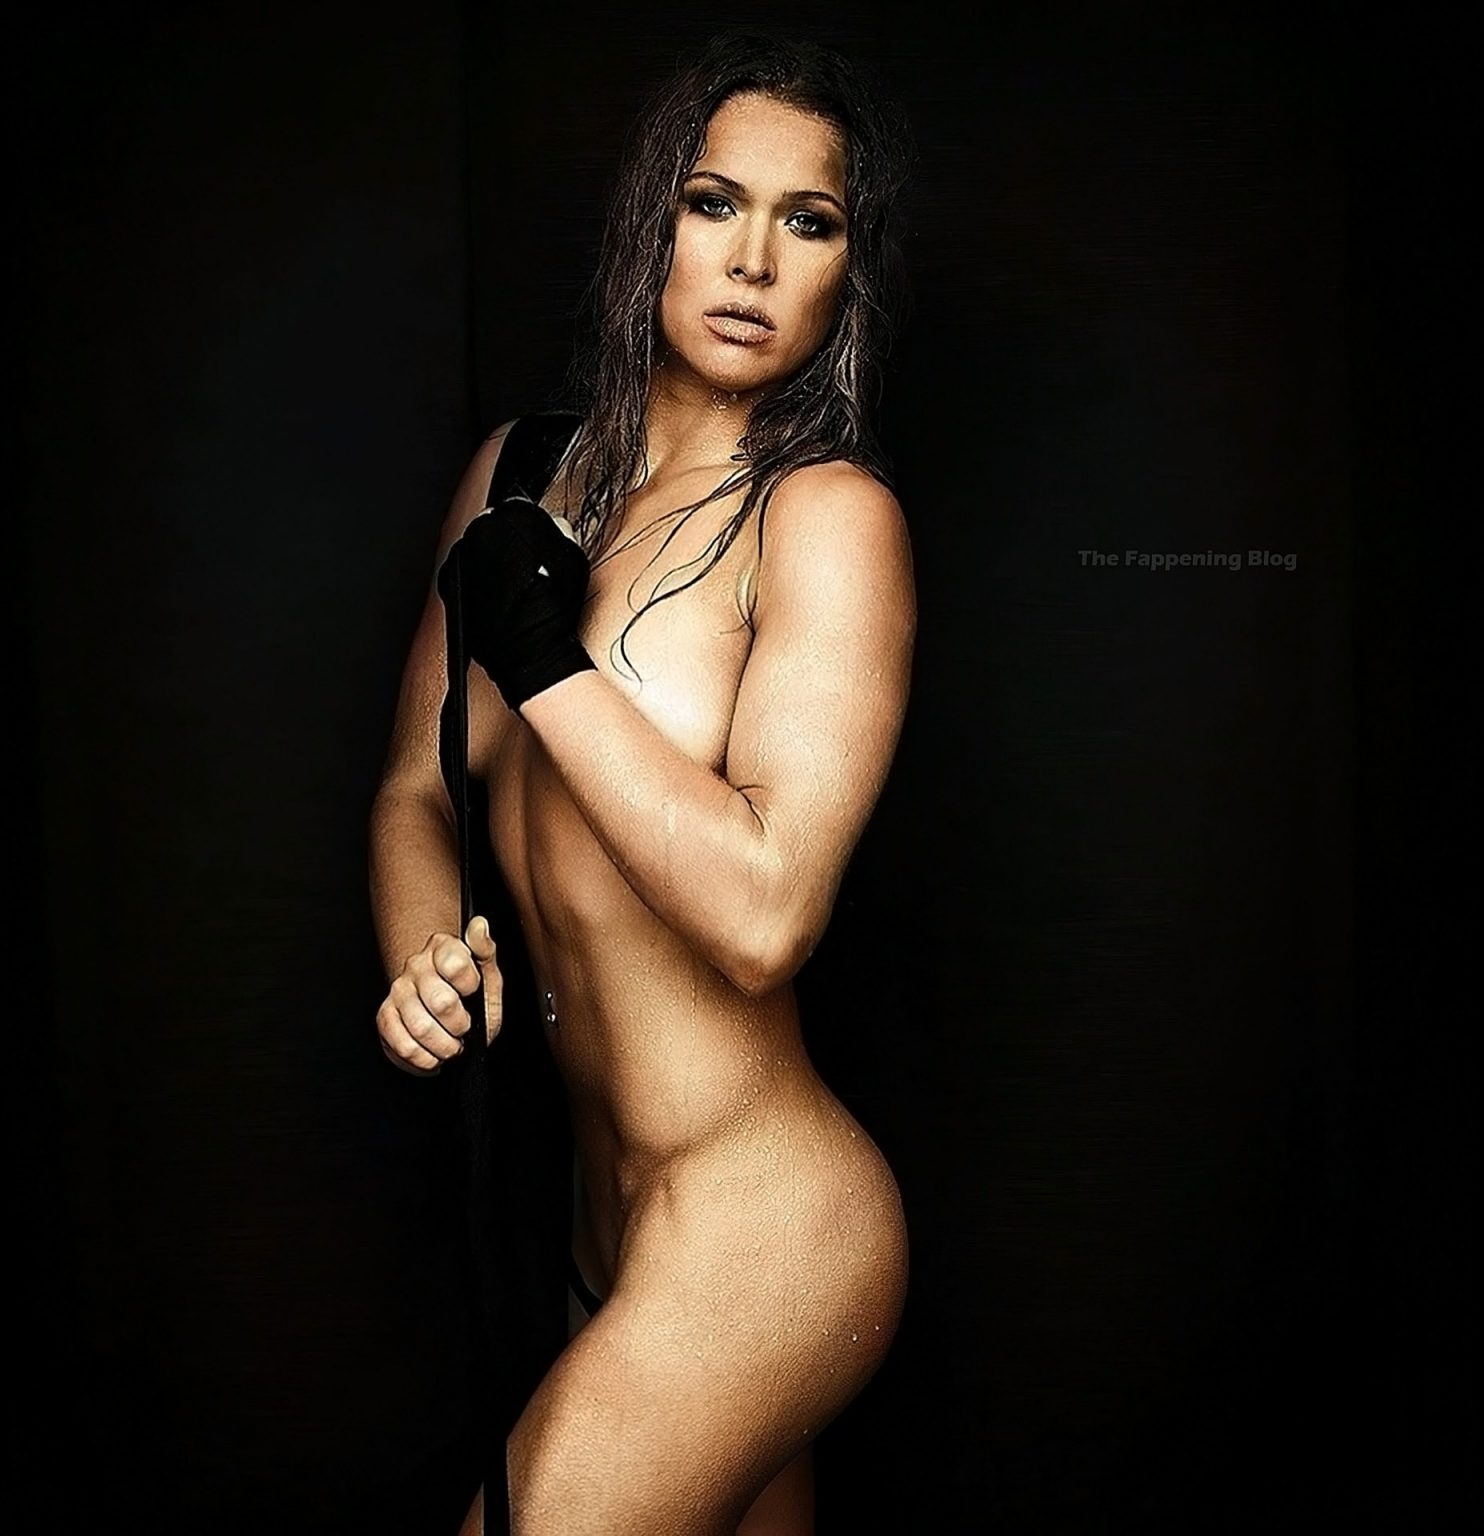 rousey shots Ronda nude